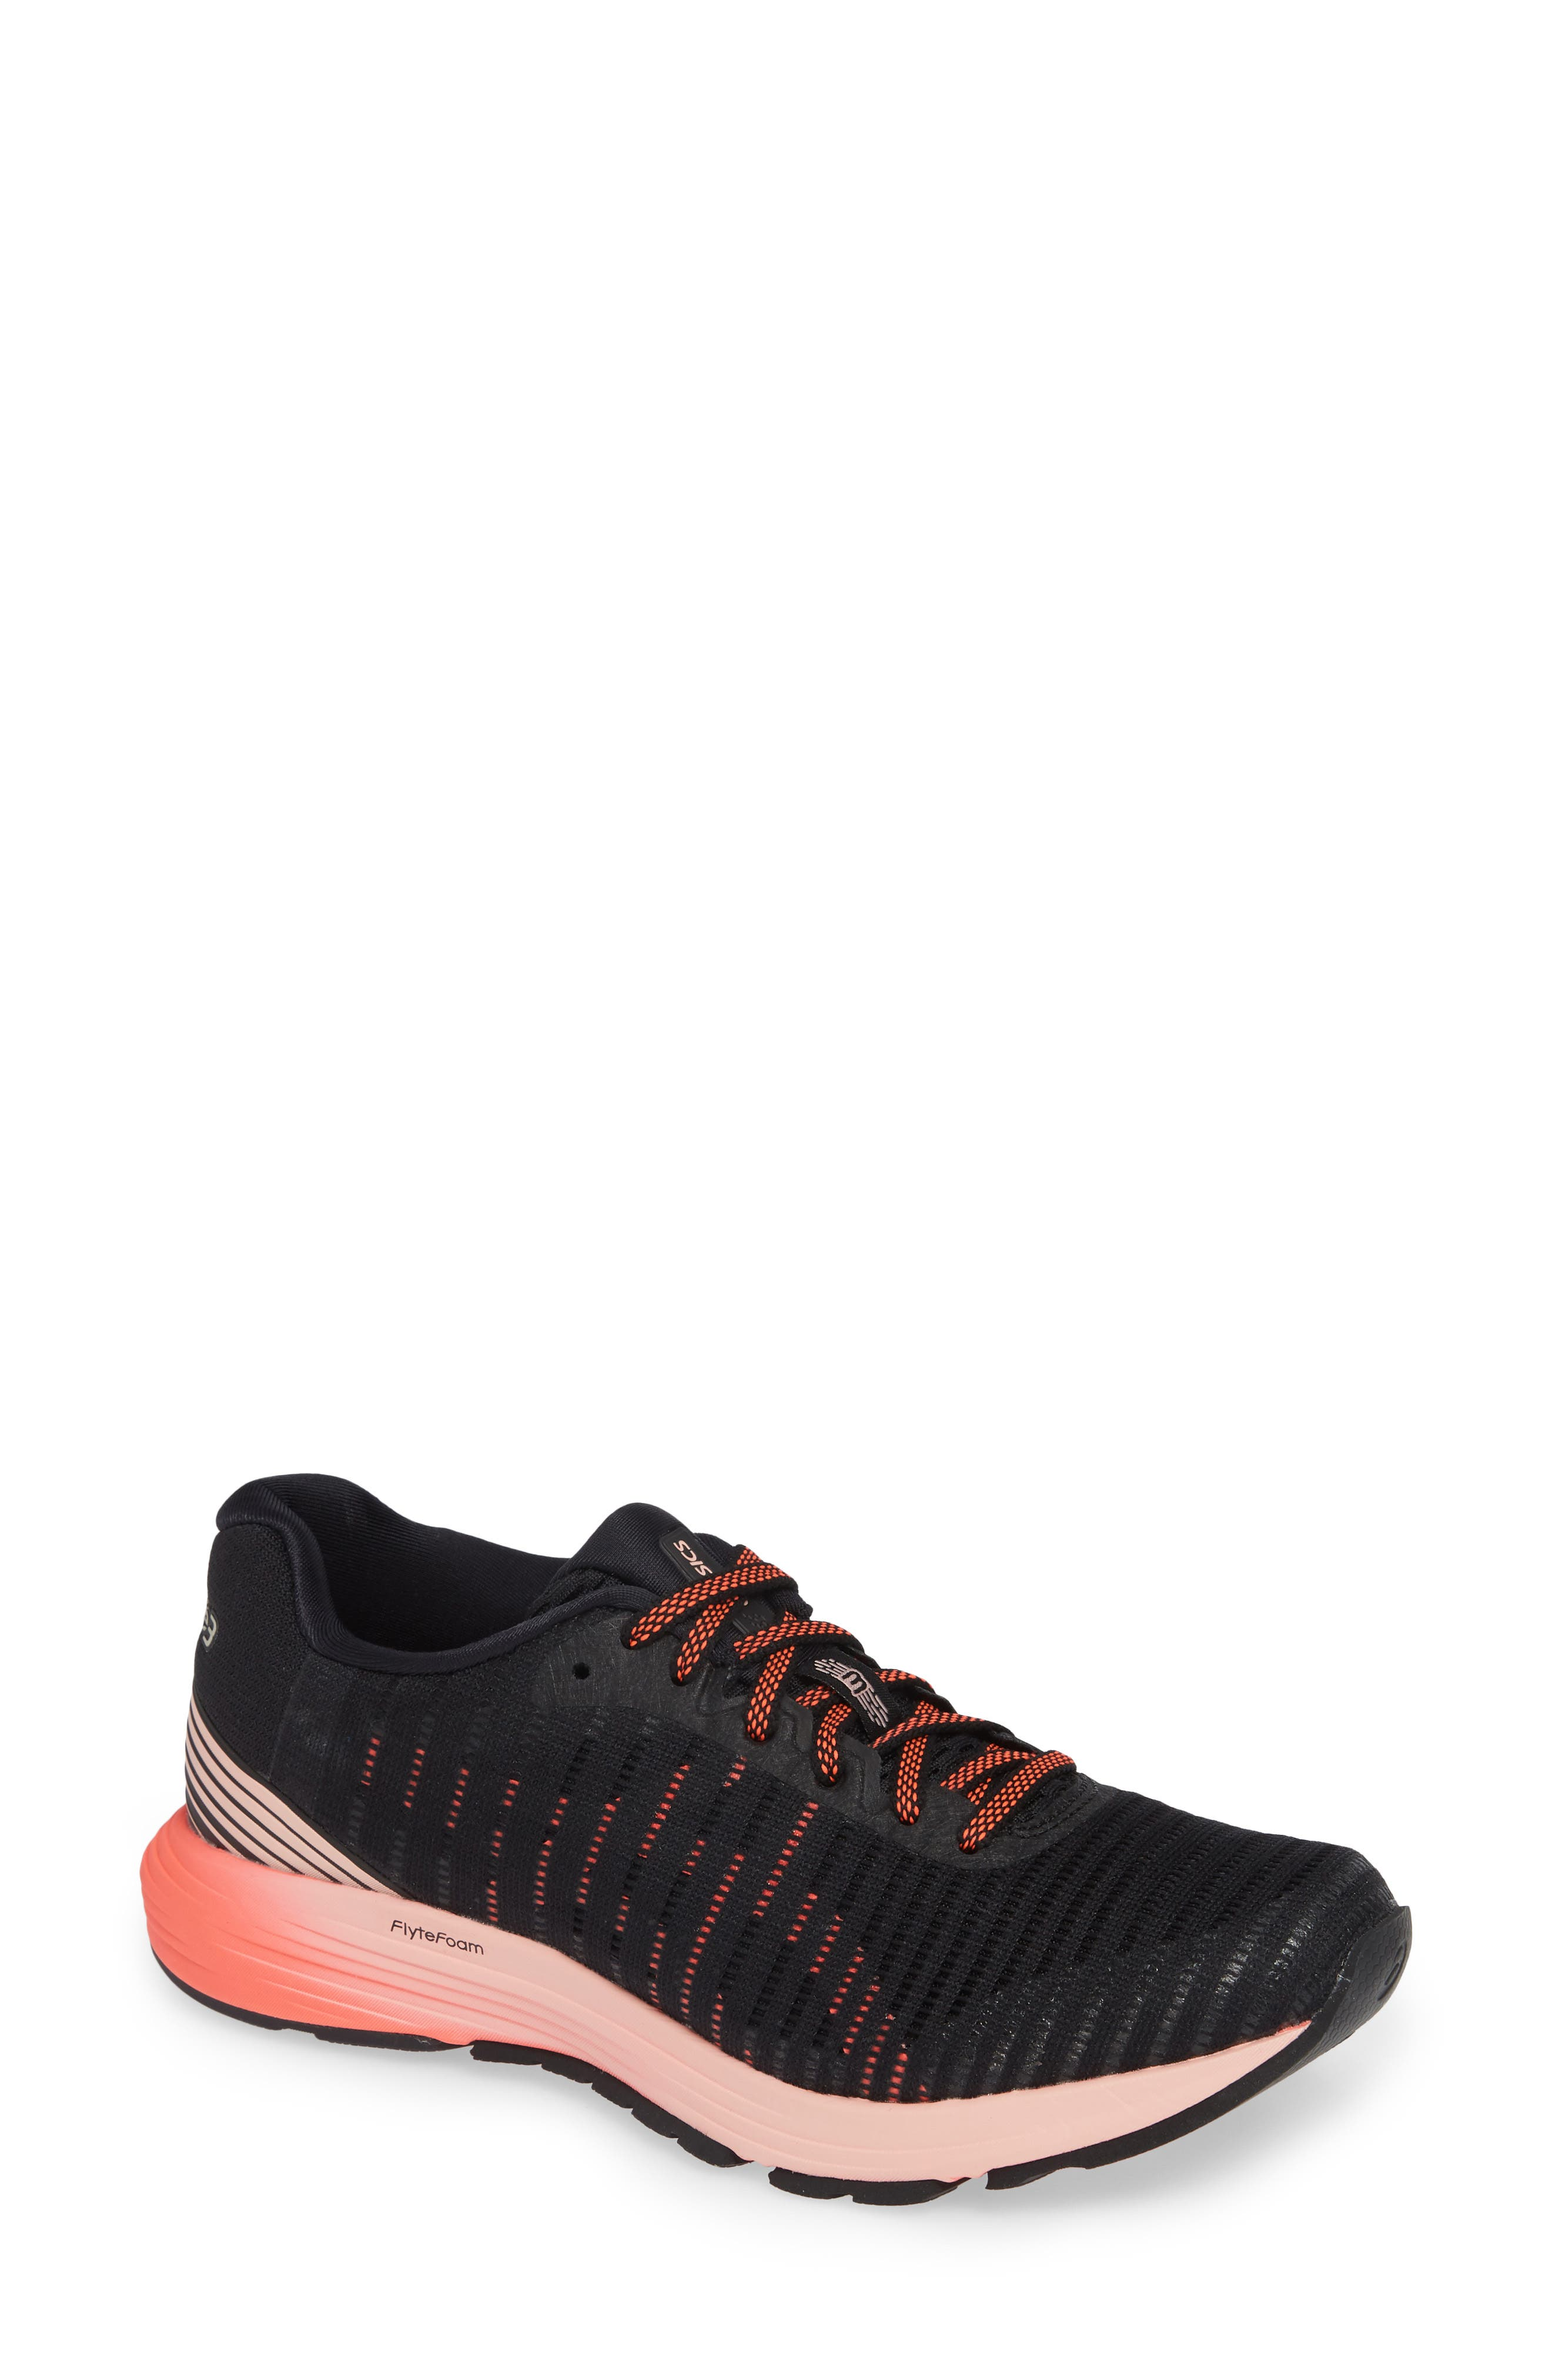 Asics Dynaflyte 3 Running Shoe, Black